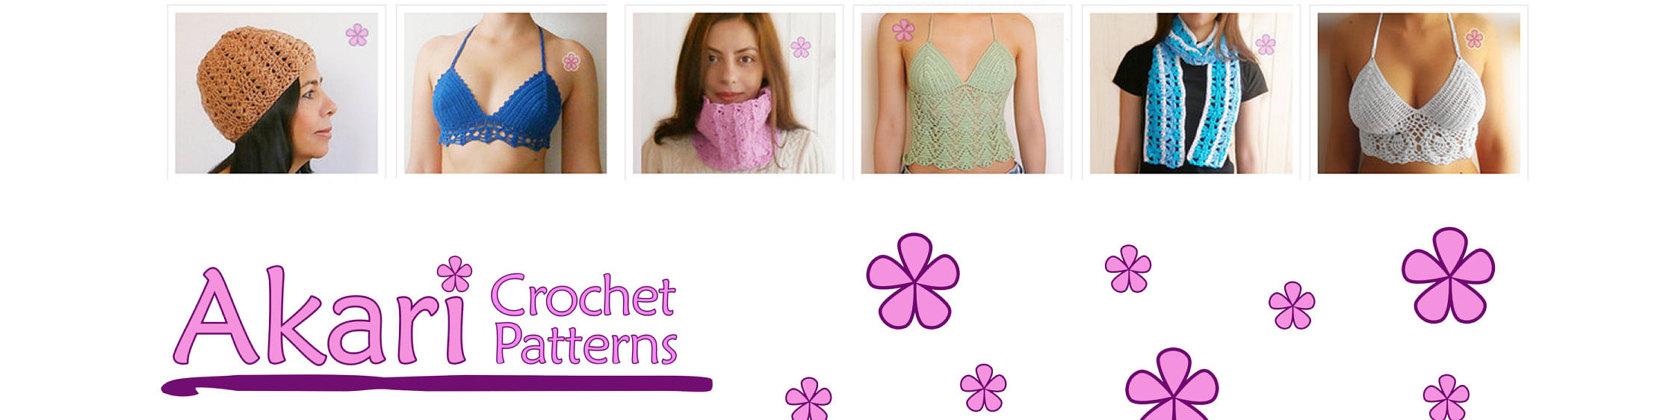 Designer Showcase - Akari Crochet